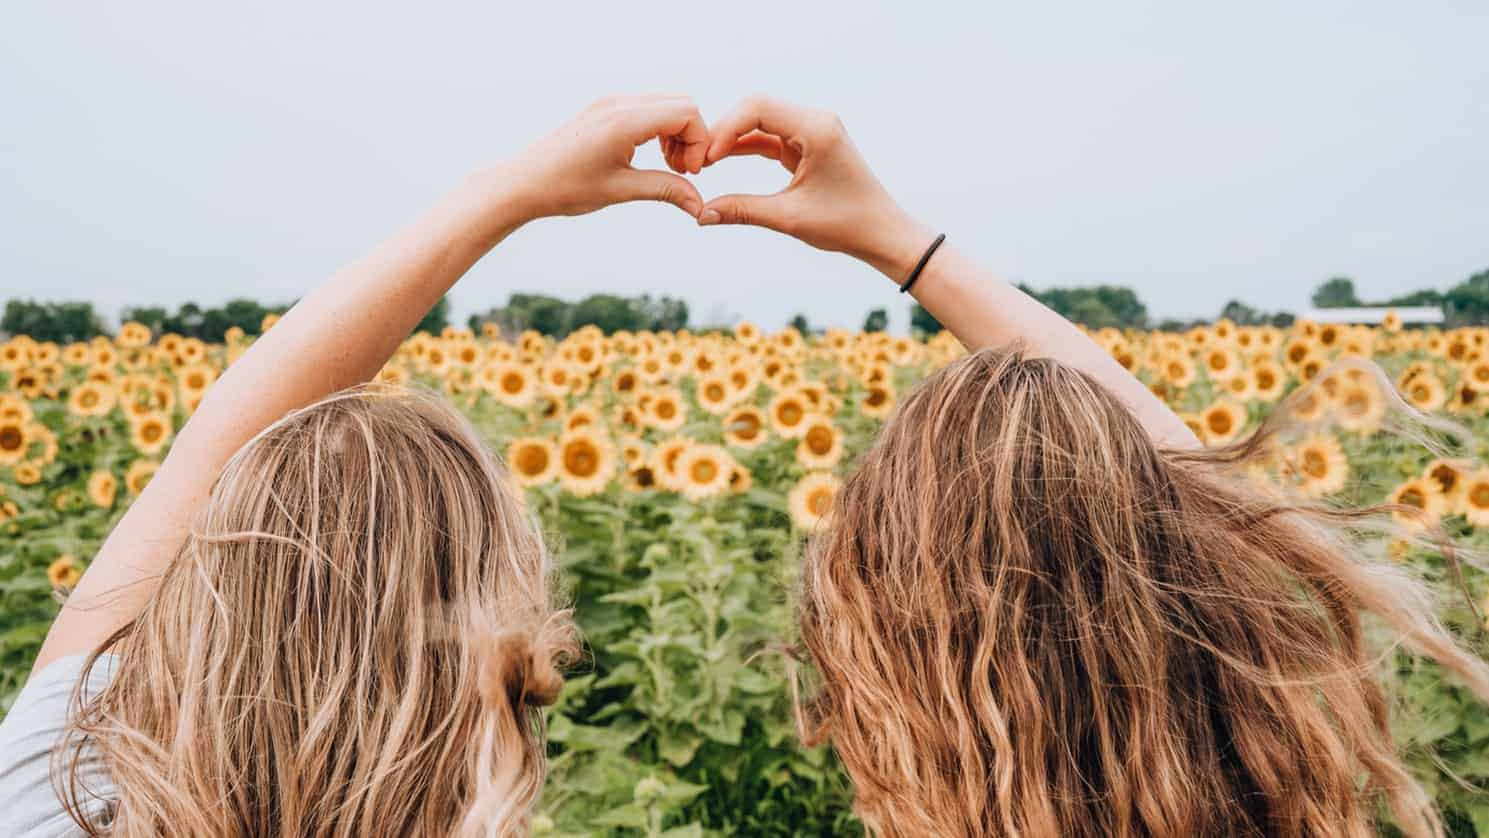 Positivity and gratitude